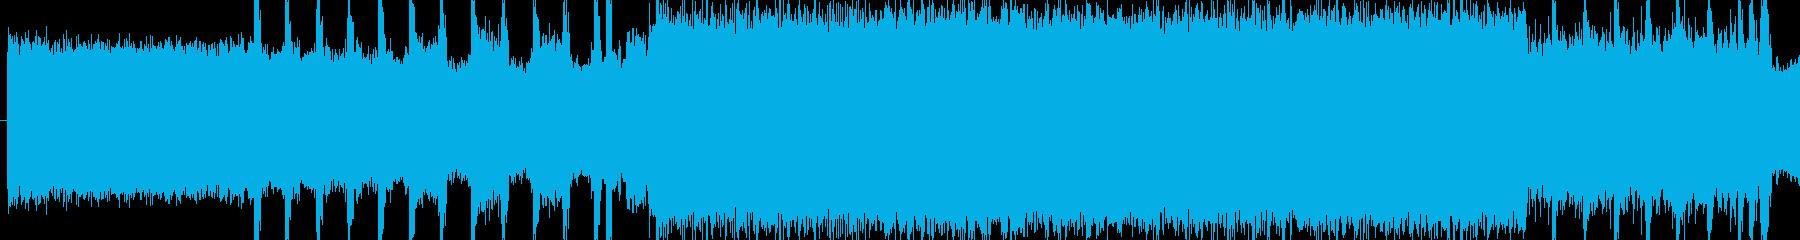 SEの再生済みの波形